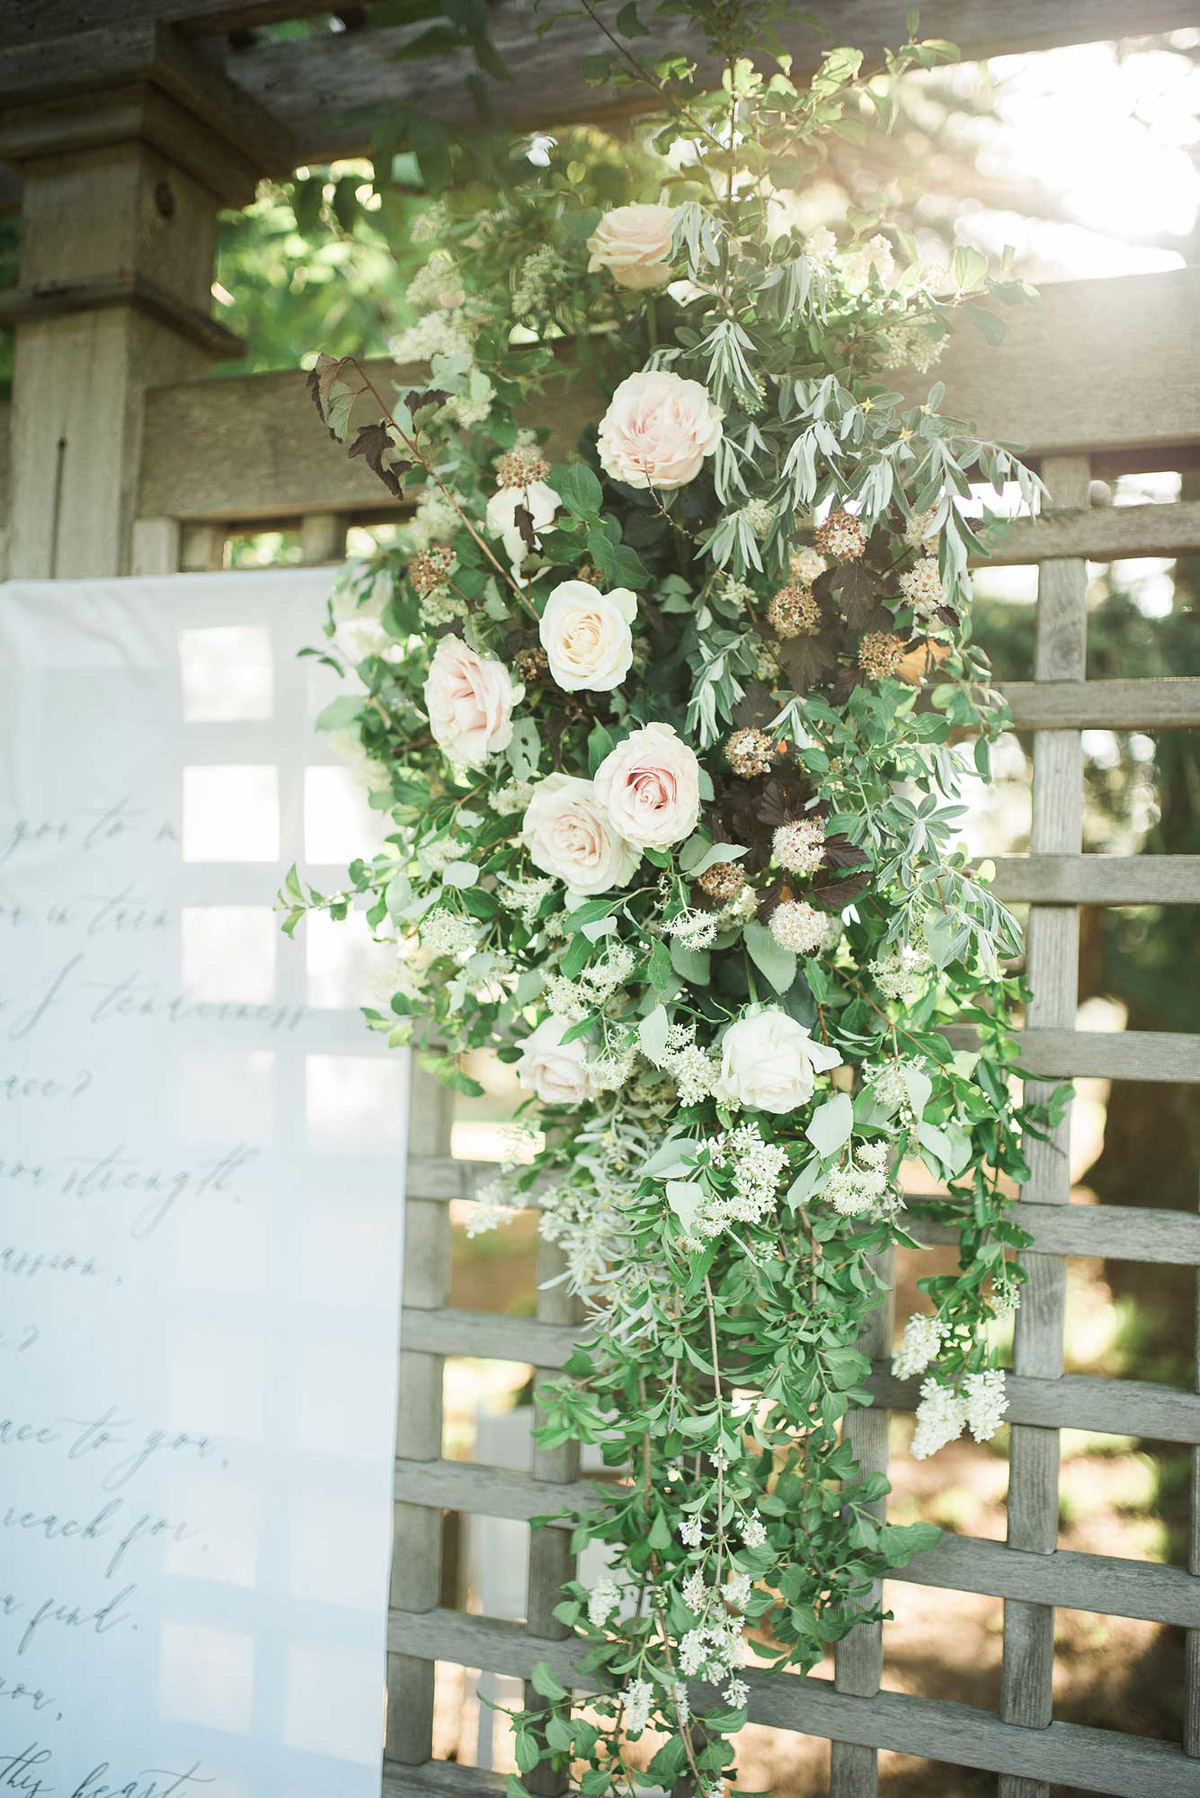 destiny-dawn-photography-vineyard-bride-swish-list-knollwood-golf-and-country-club-ancaster-wedding-editorial-13.jpg